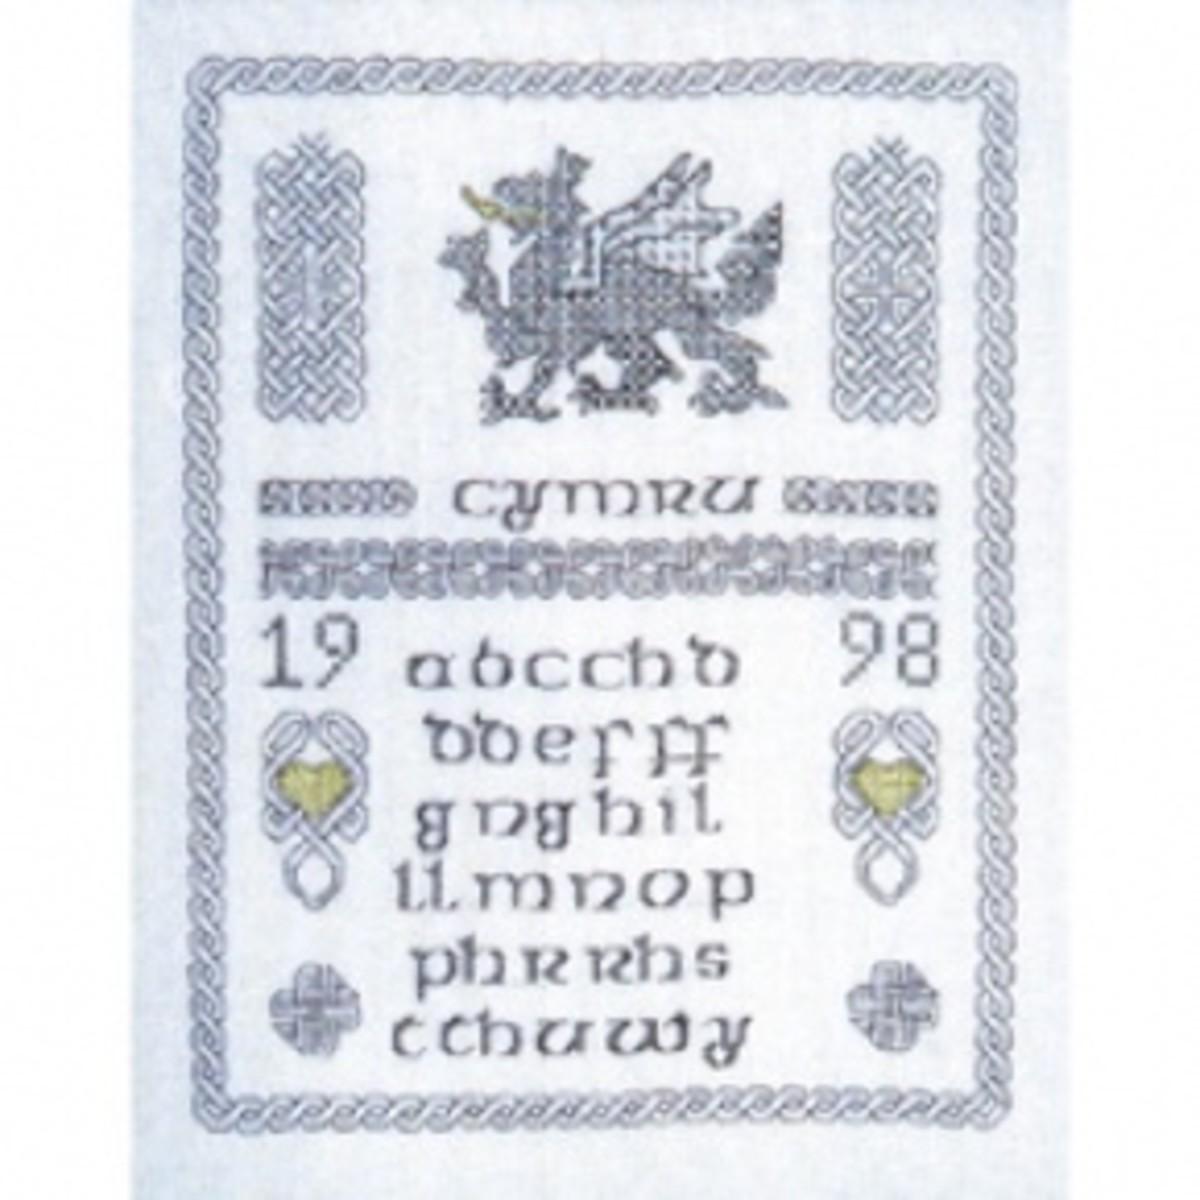 Ornate sampler depicting the Welsh dragon and masses of Celtic knots.  With Welsh alphabet.